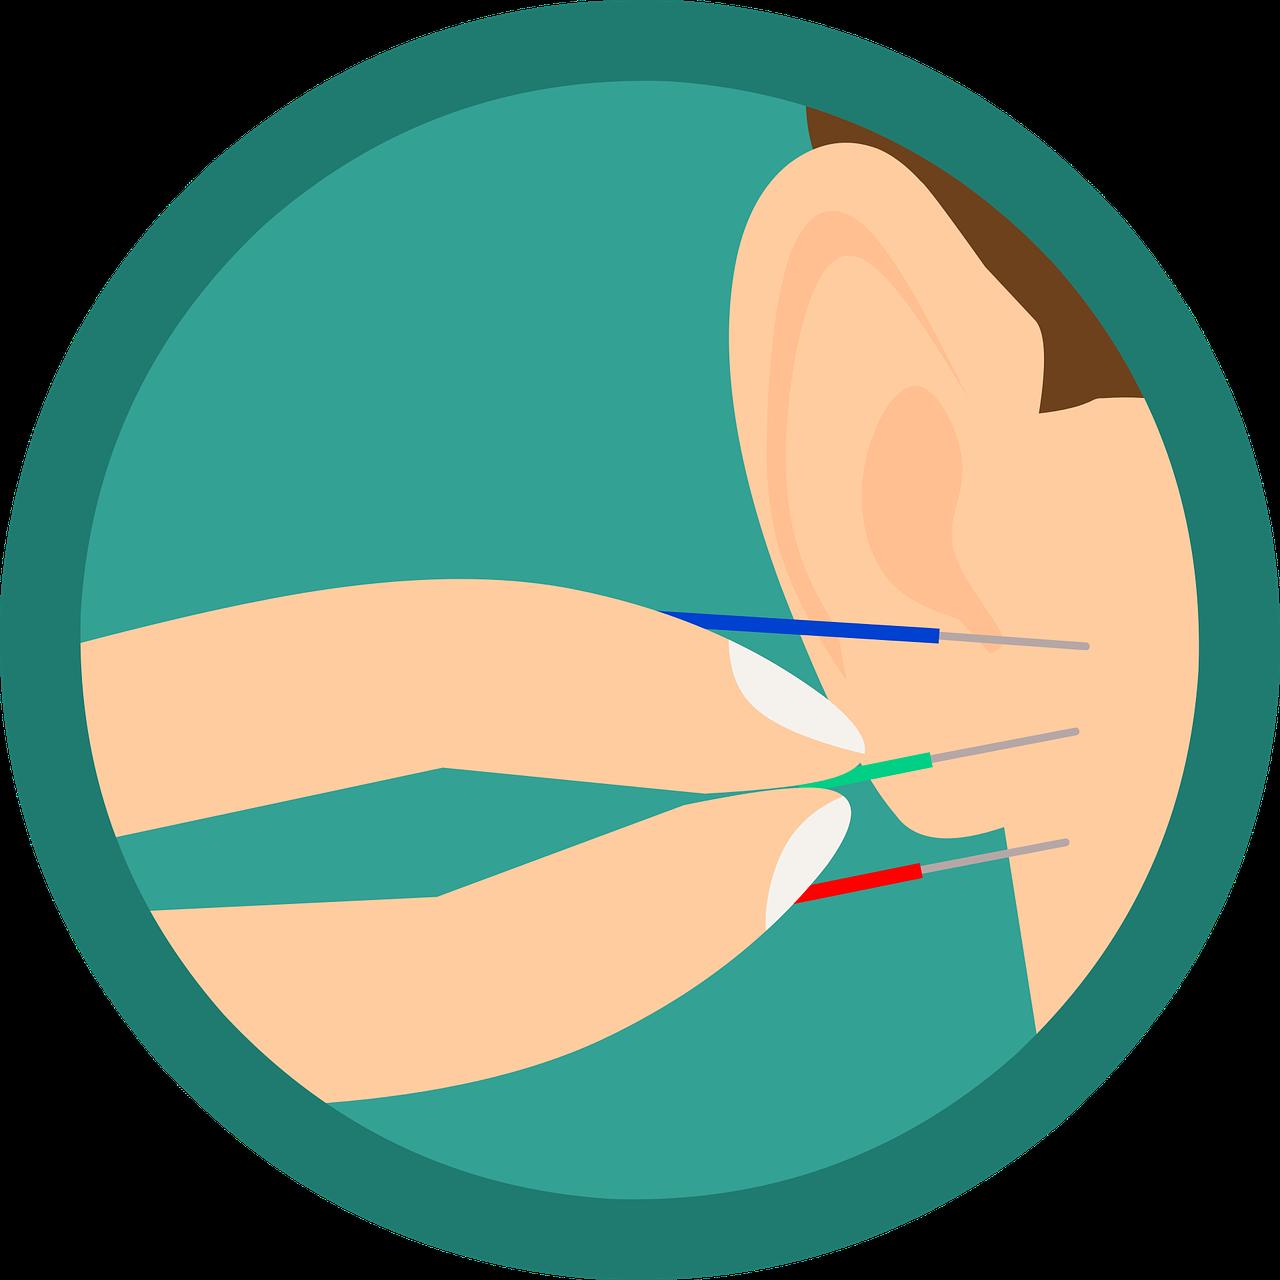 Bavel Topfysiotherapie physiotherapie